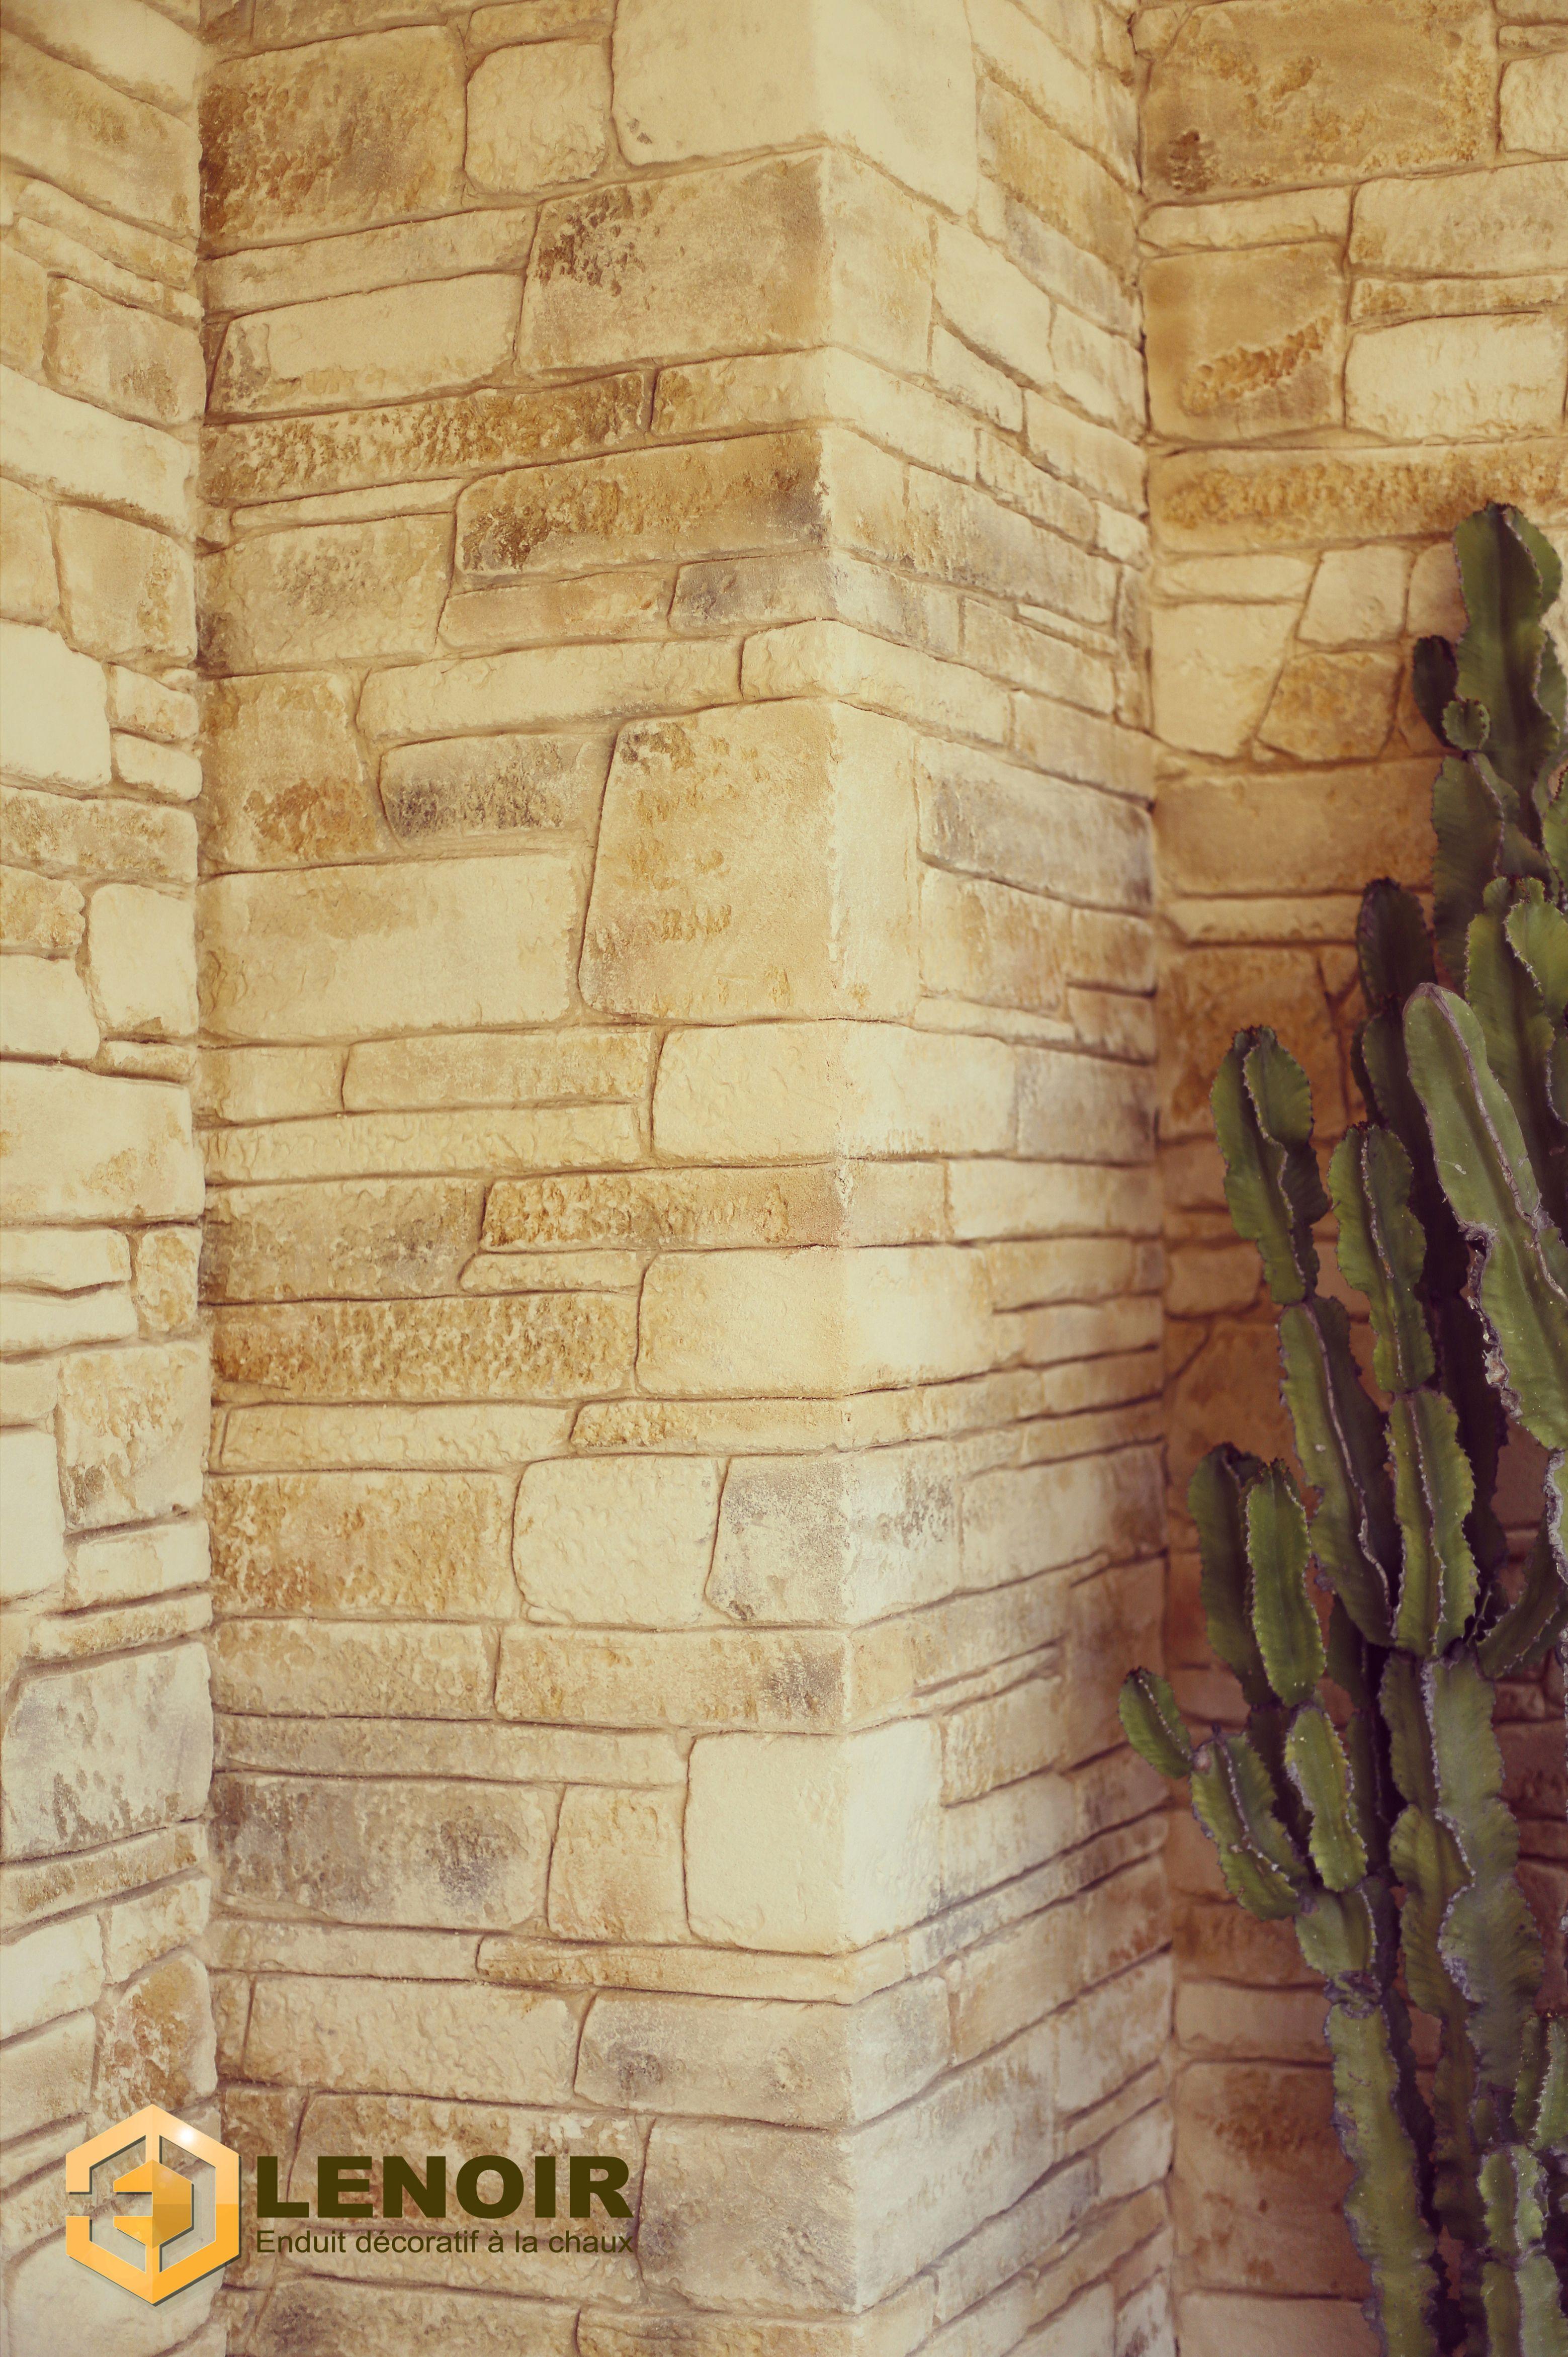 Habiller Un Conduit De Cheminée habillage décoratif d'un conduit de cheminée imitation